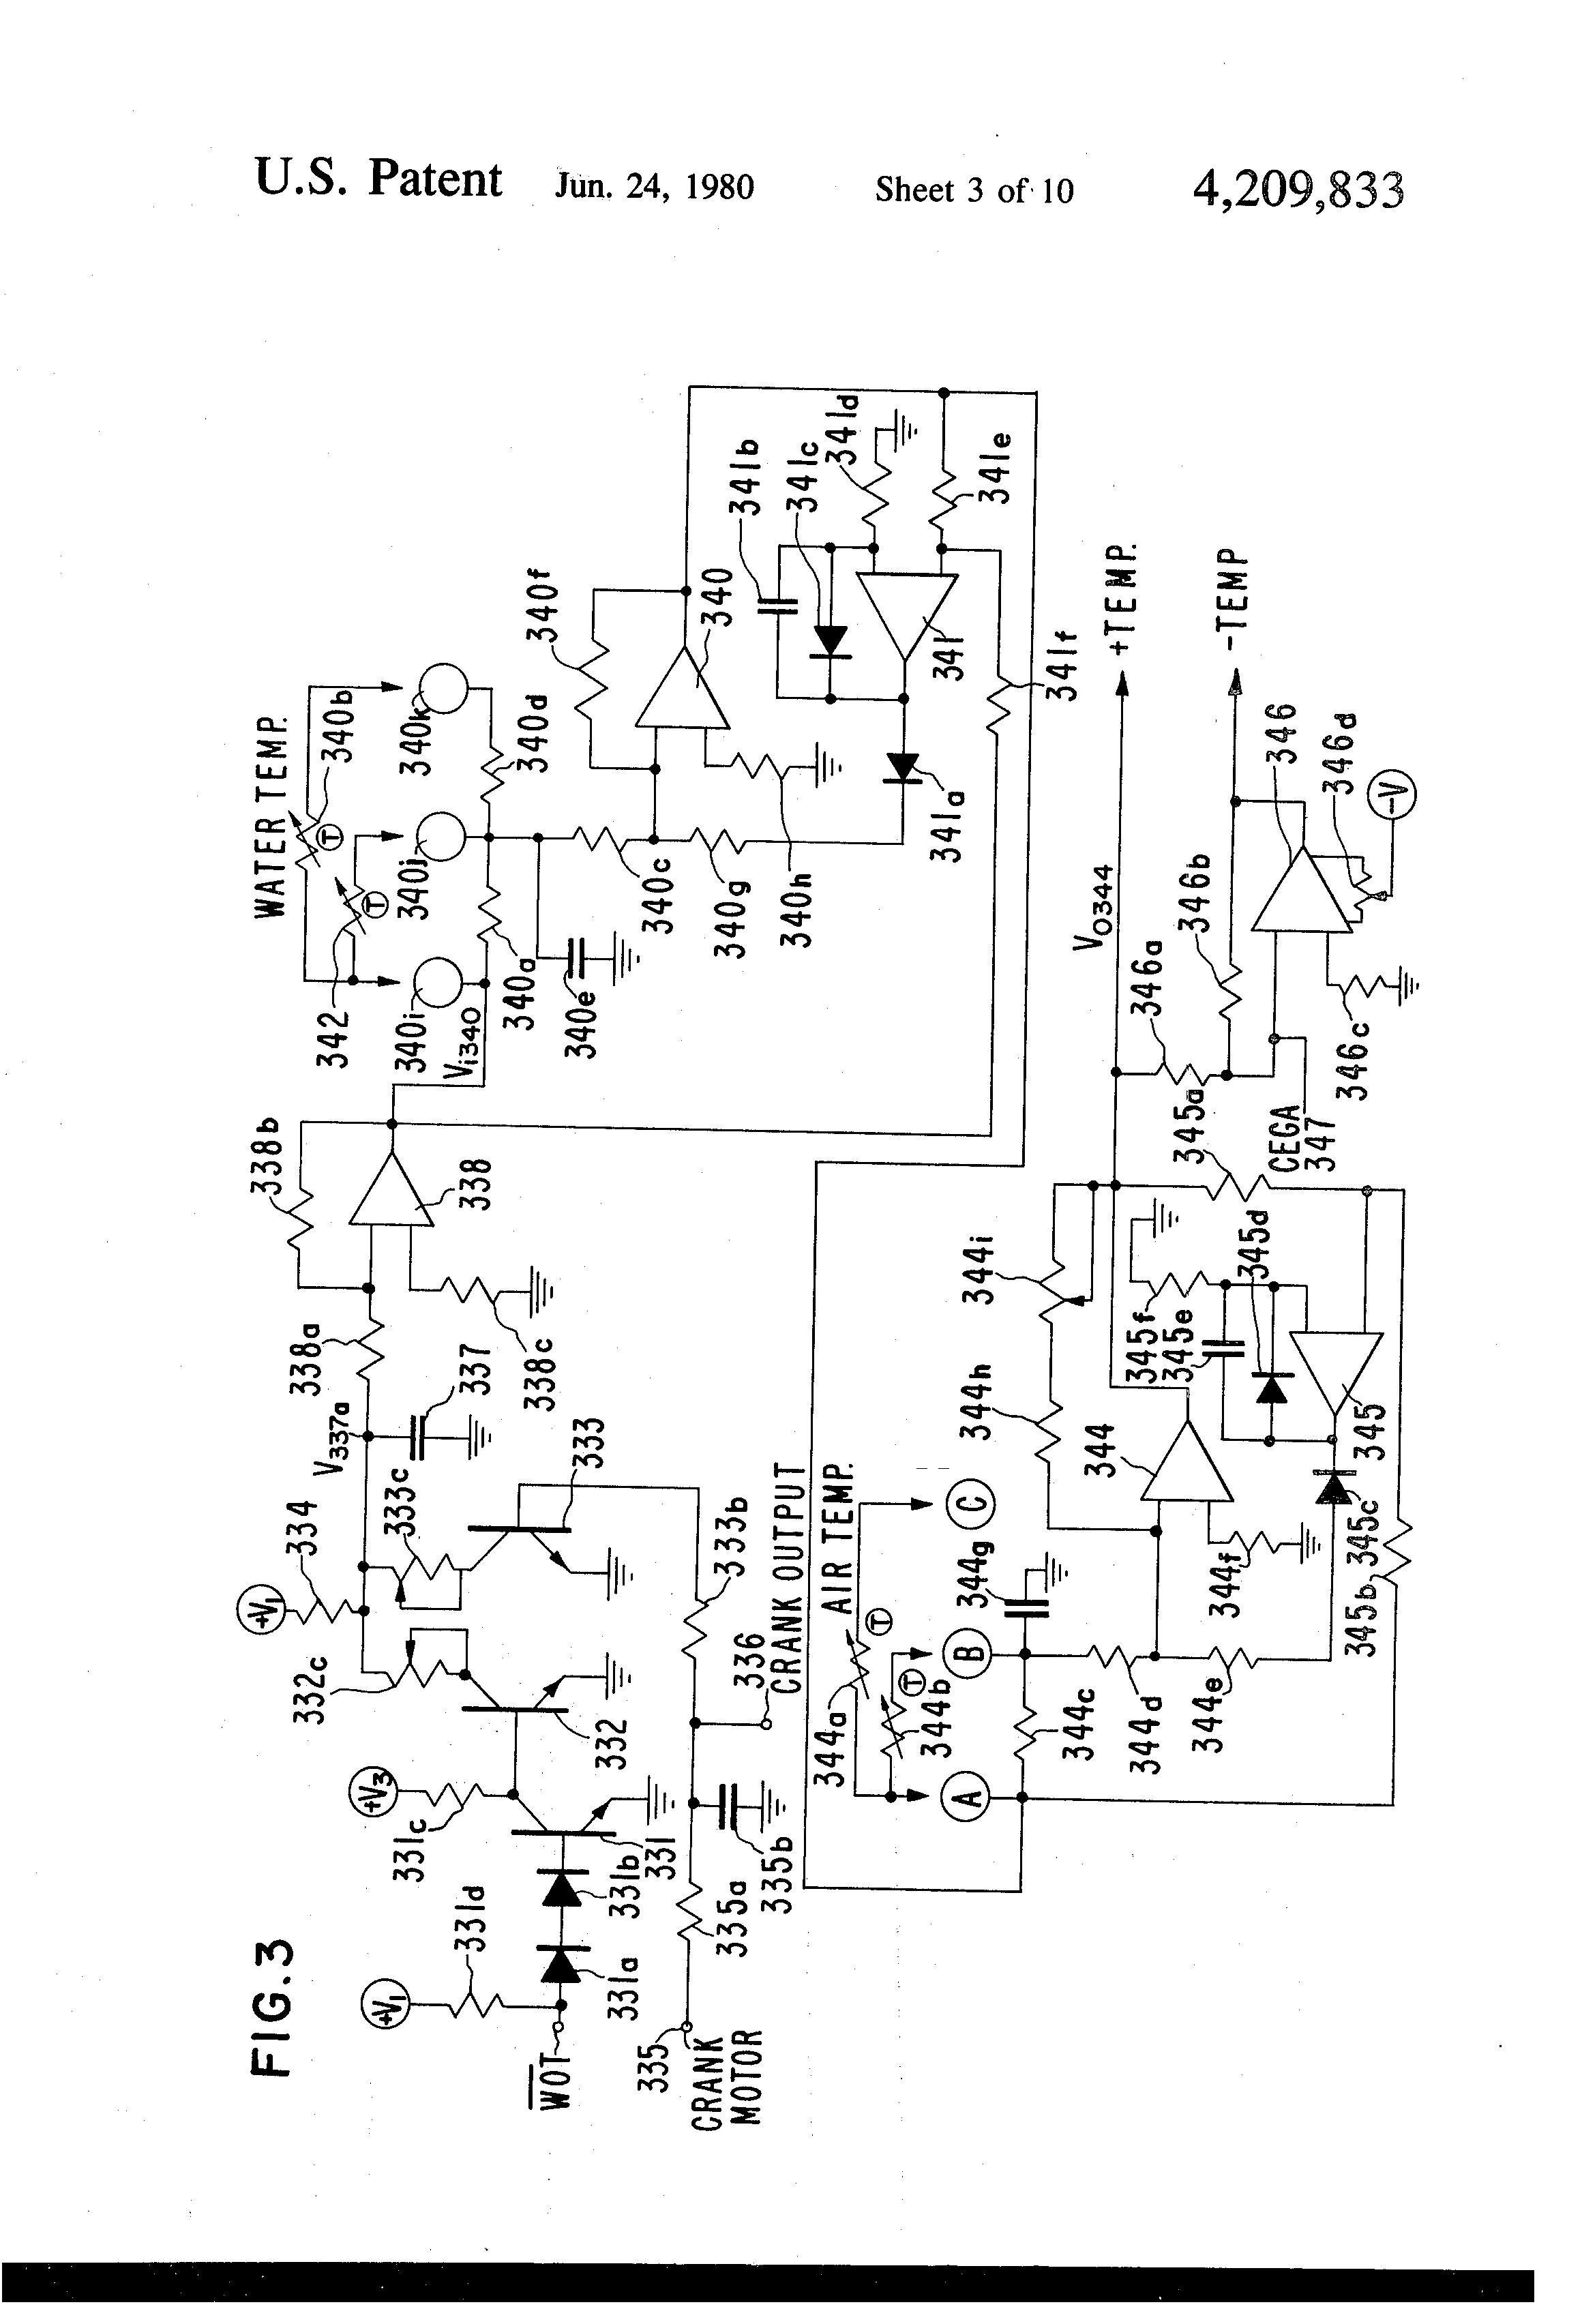 Brevet Us4209833 Electronic Control System Google Brevets Threebit Temperature Controller Circuit Controlcircuit Patent Drawing